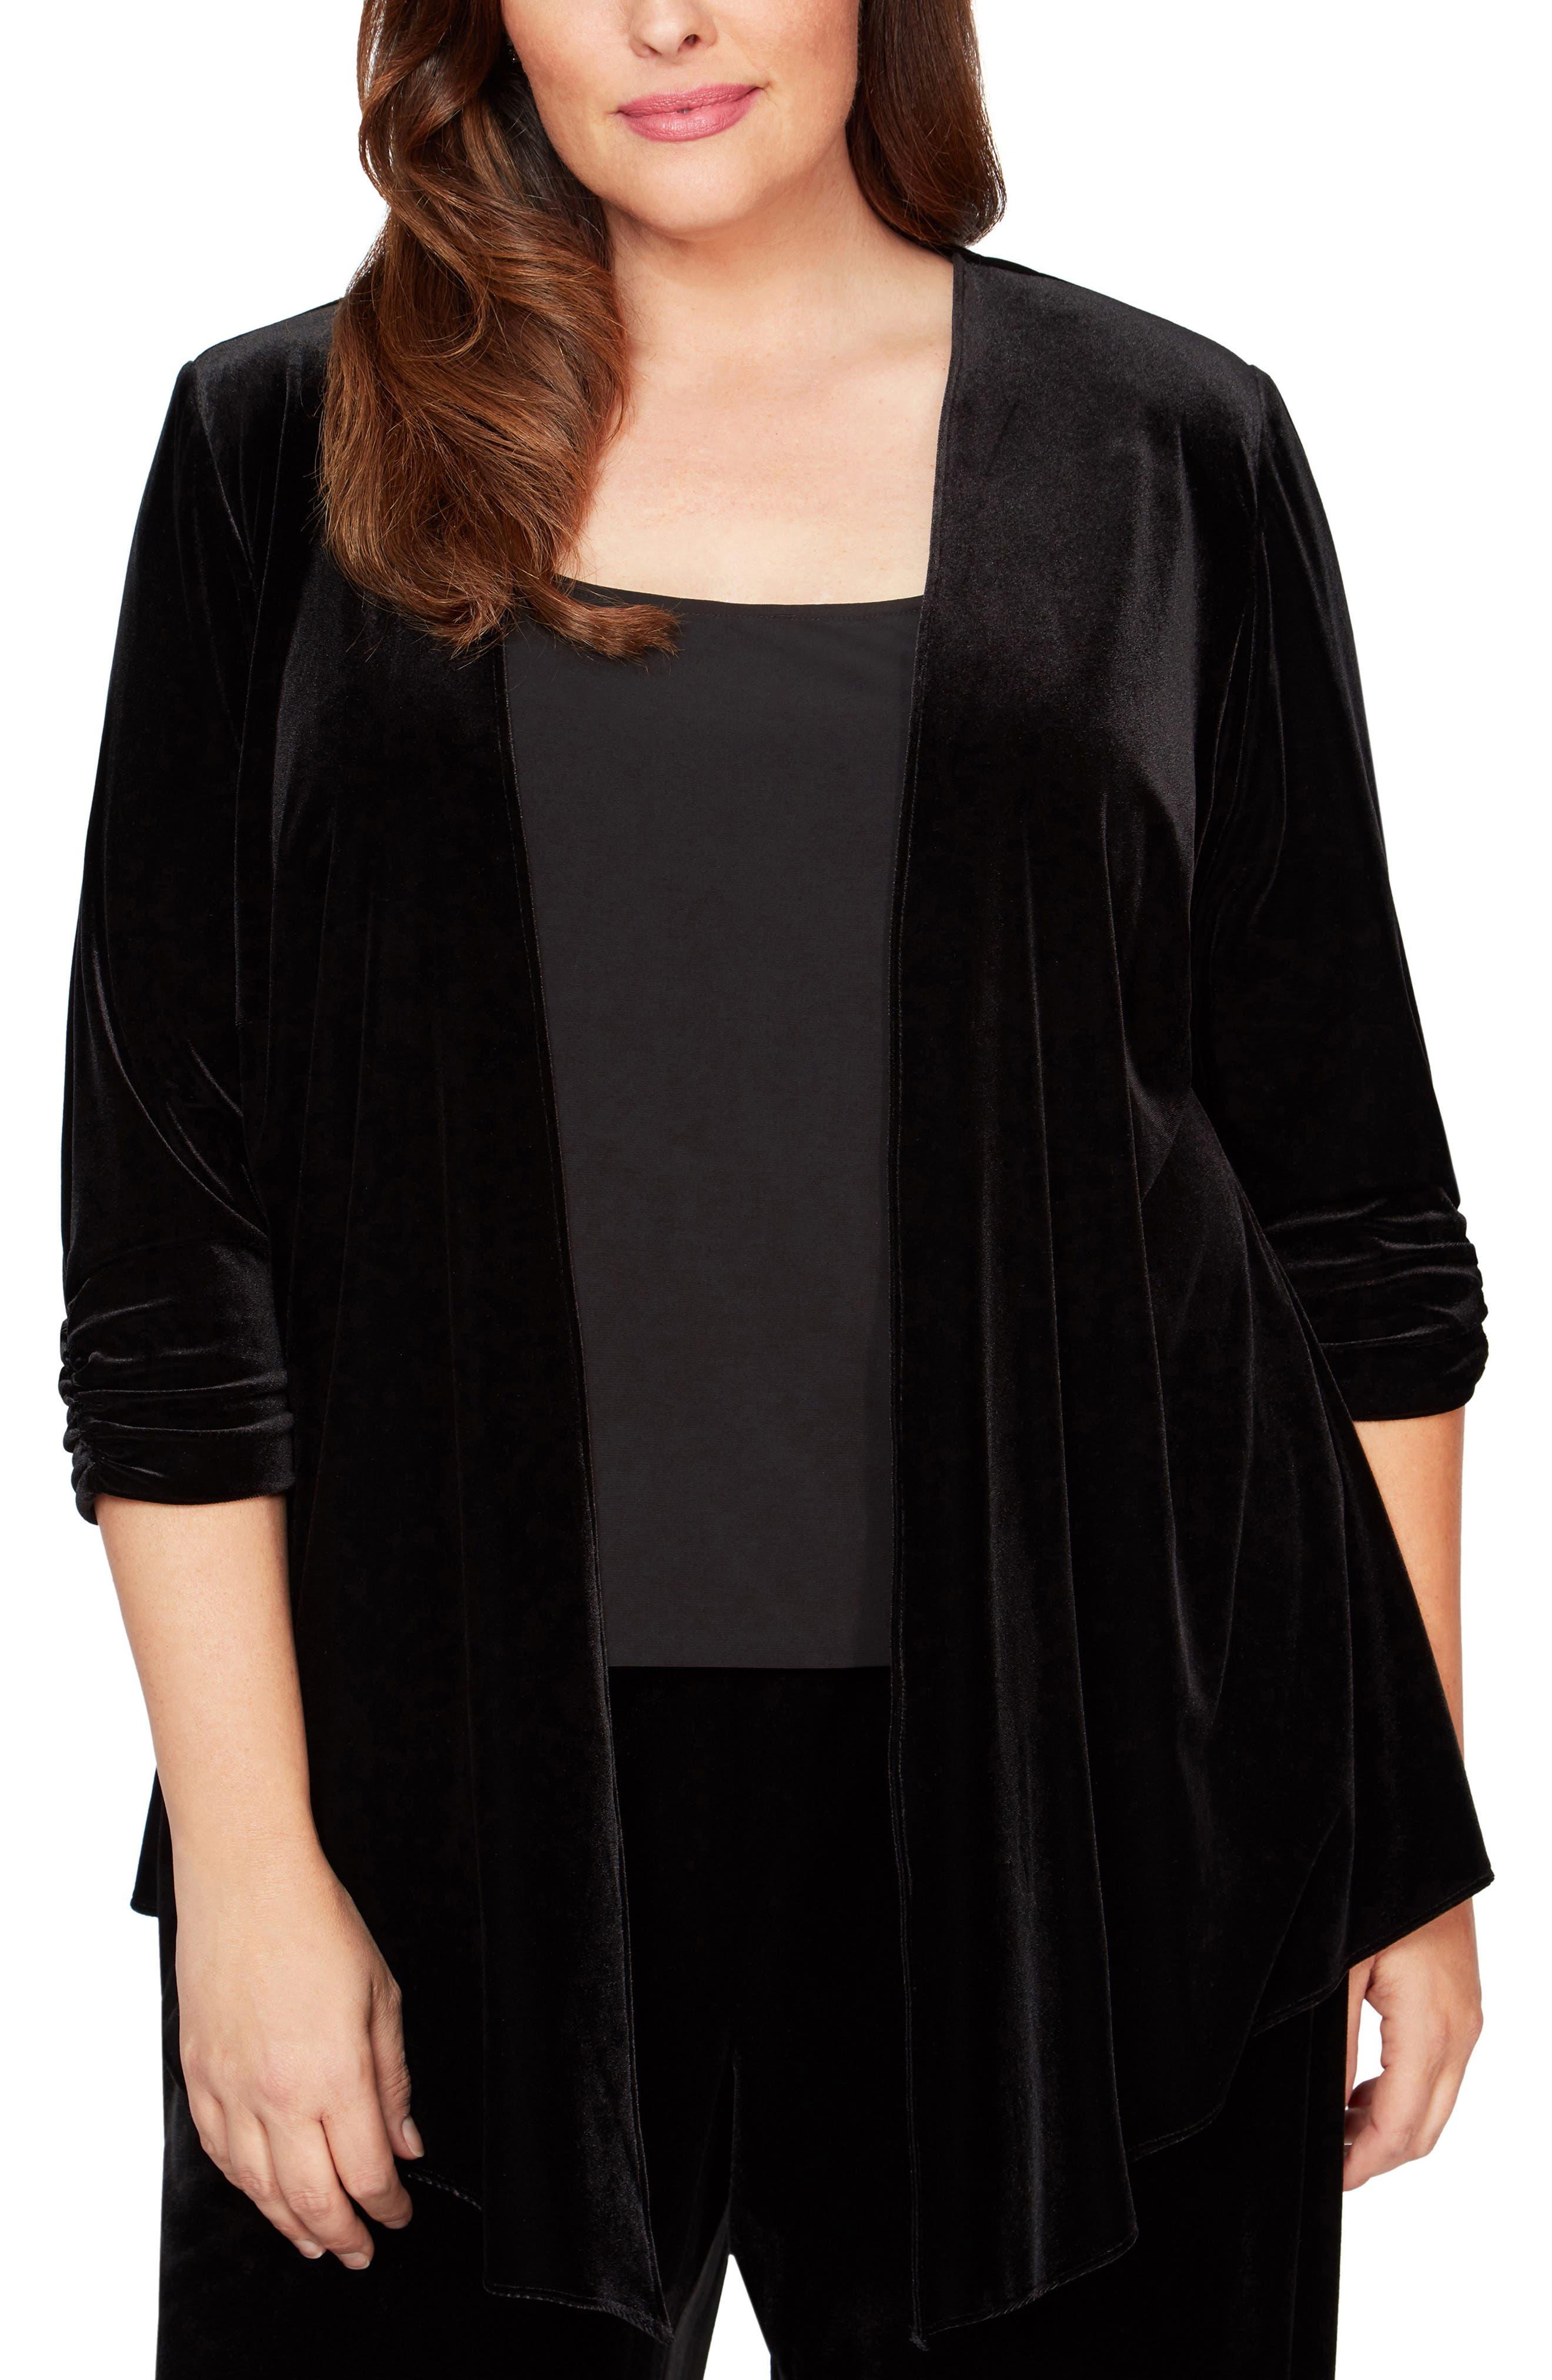 1920s Coats, Furs, Jackets and Capes History Plus Size Womens Alex Evenings Pointed Hem Jacket Size 2X - Black $79.00 AT vintagedancer.com